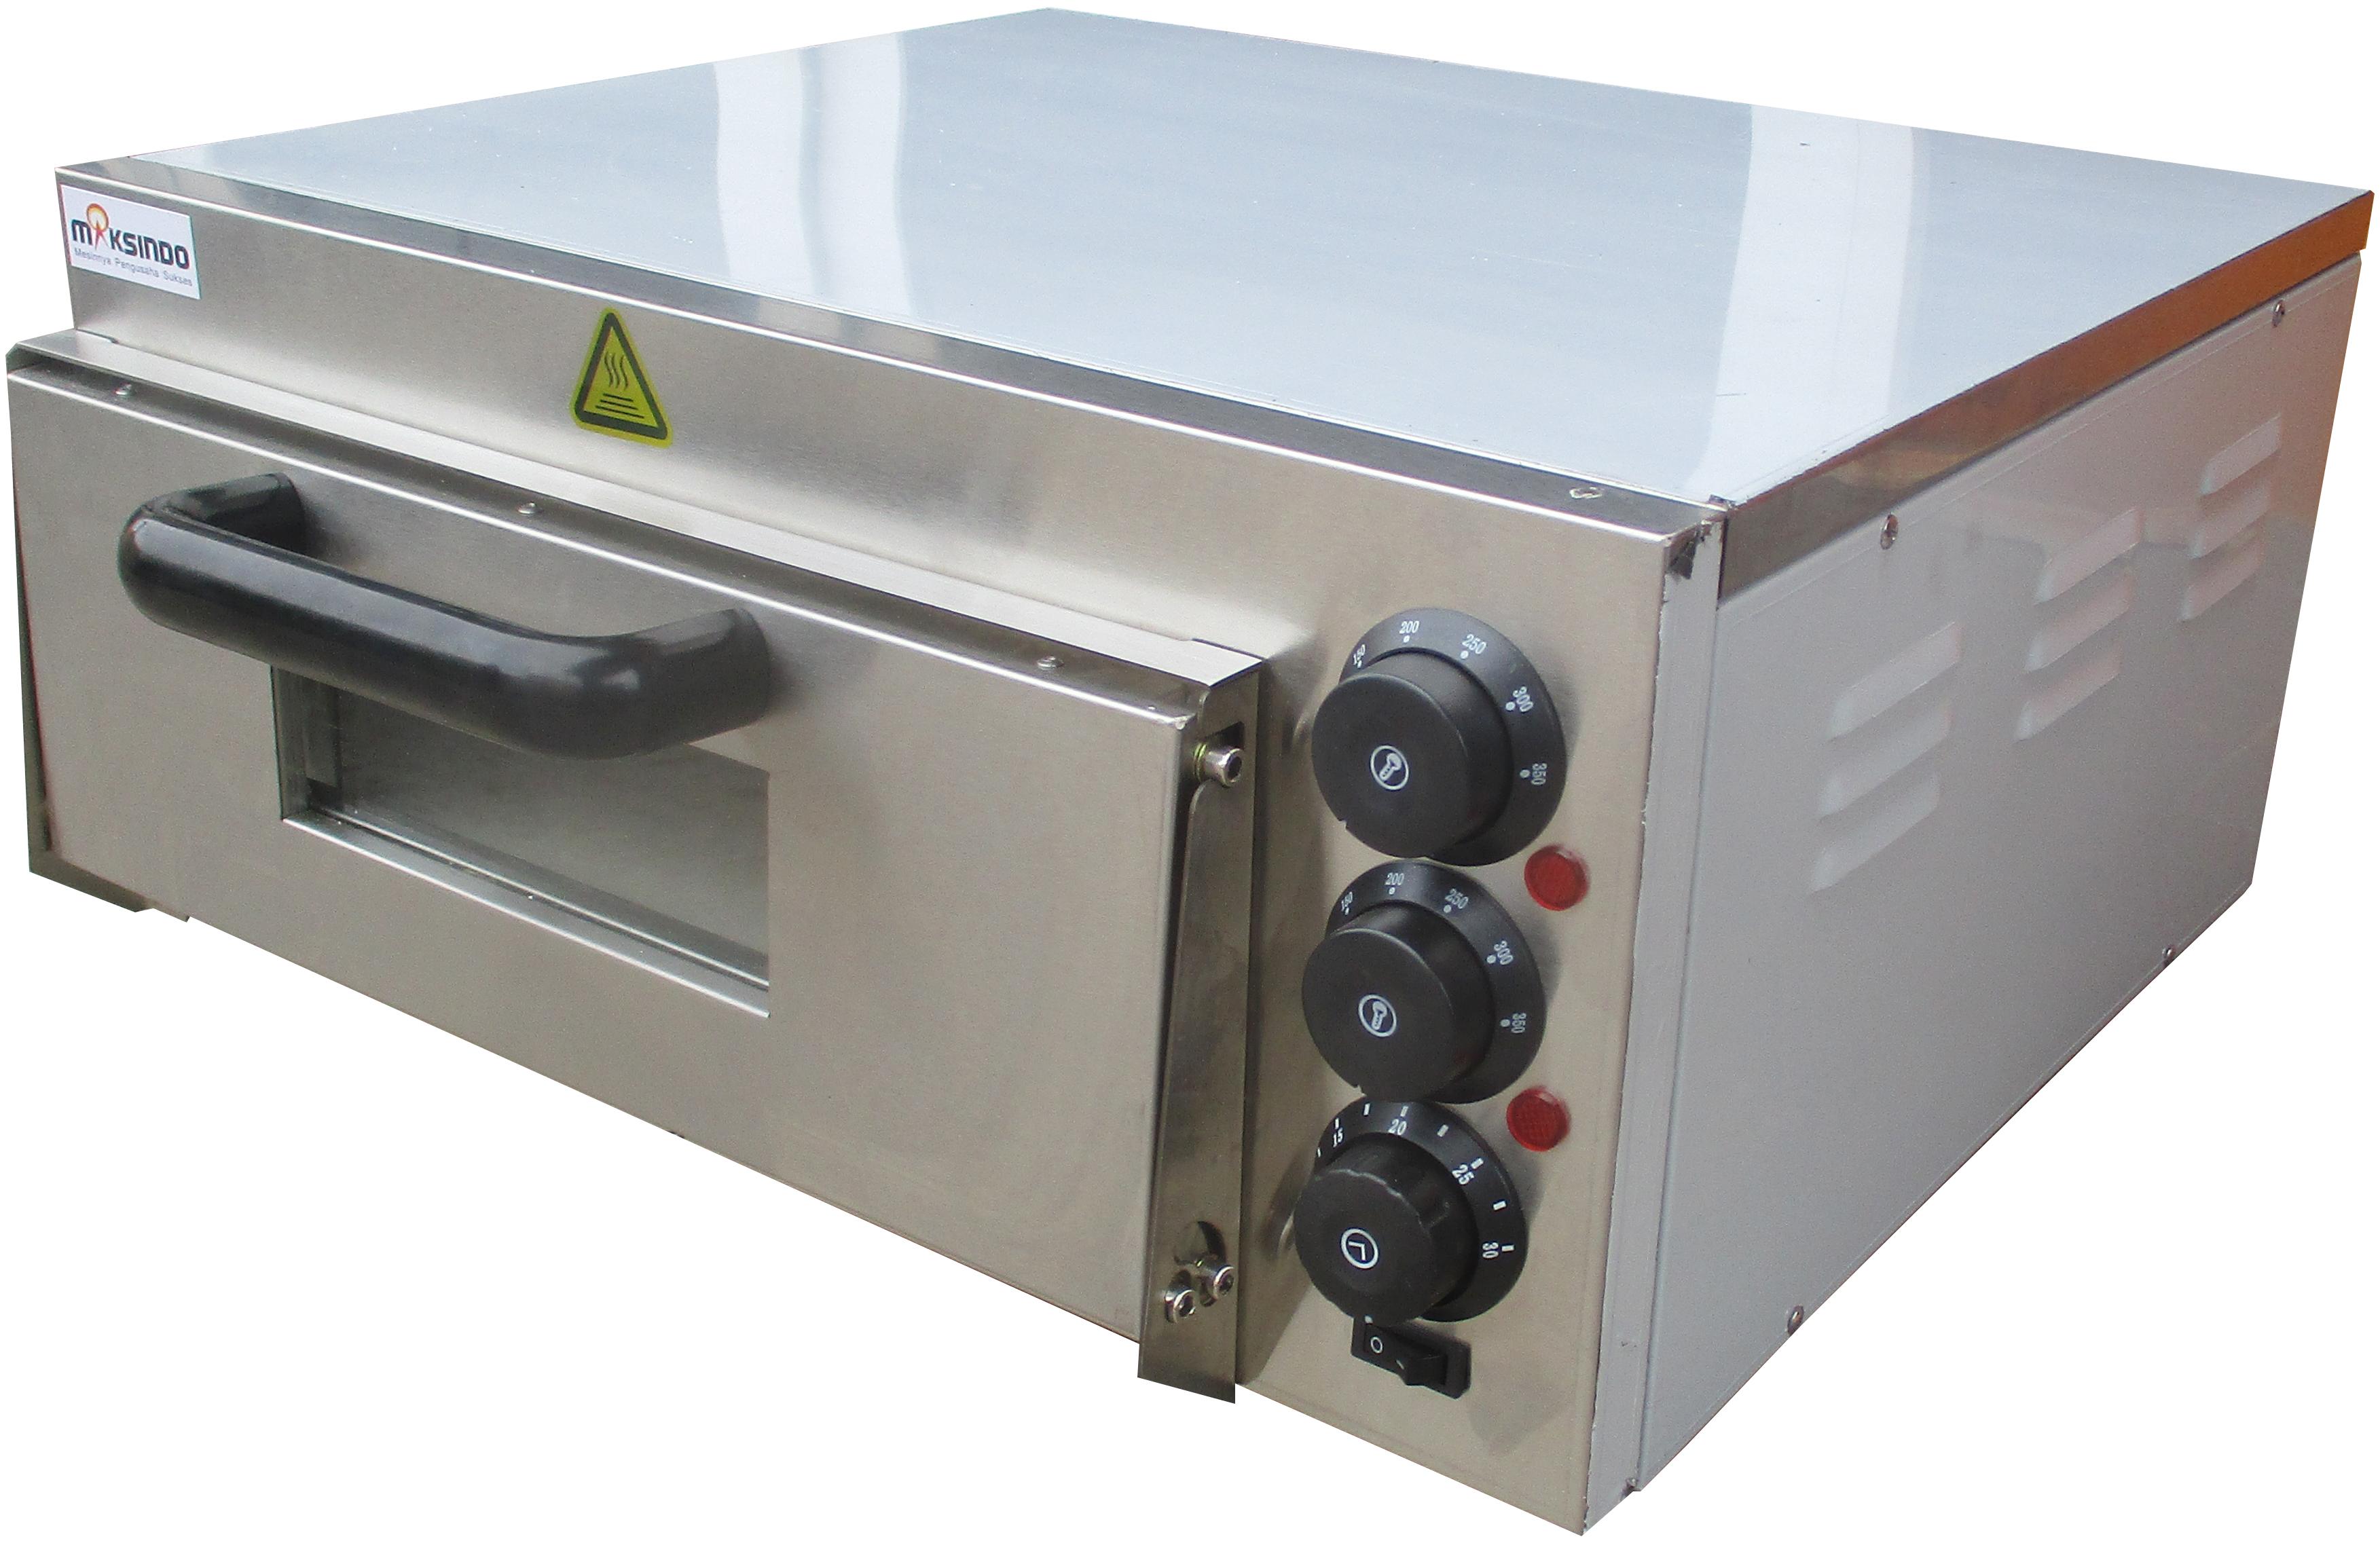 Jual Pizza Oven Listrik MKS-PO1E di Bekasi